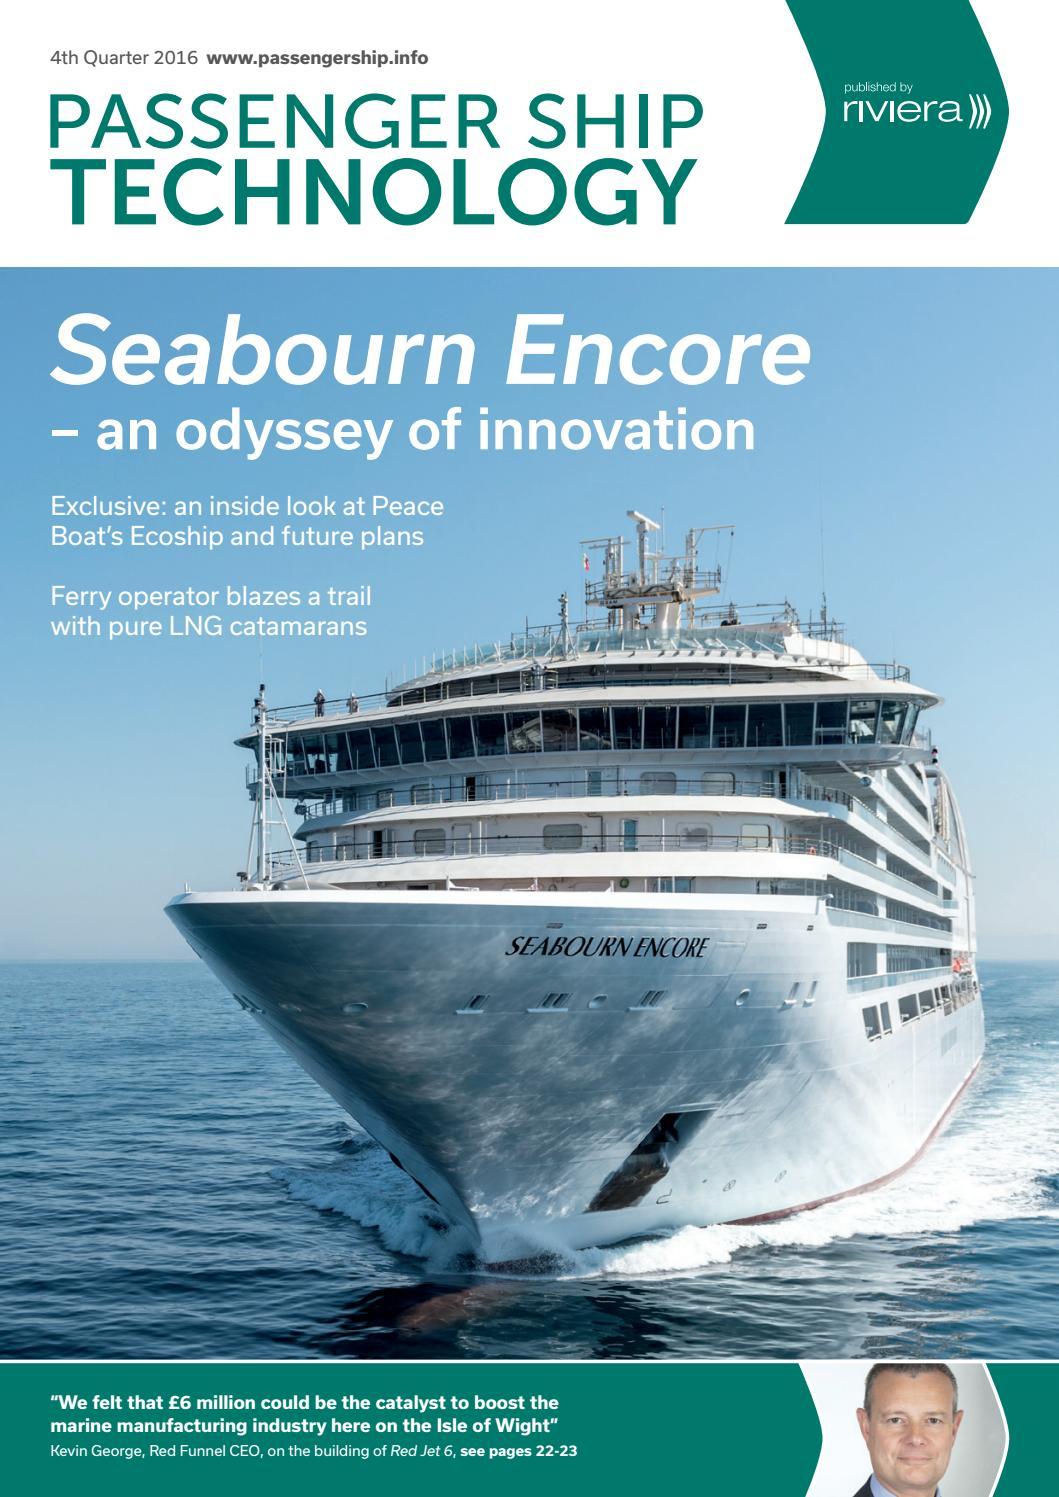 Passenger Ship Technology 4th Quarter 2016 by